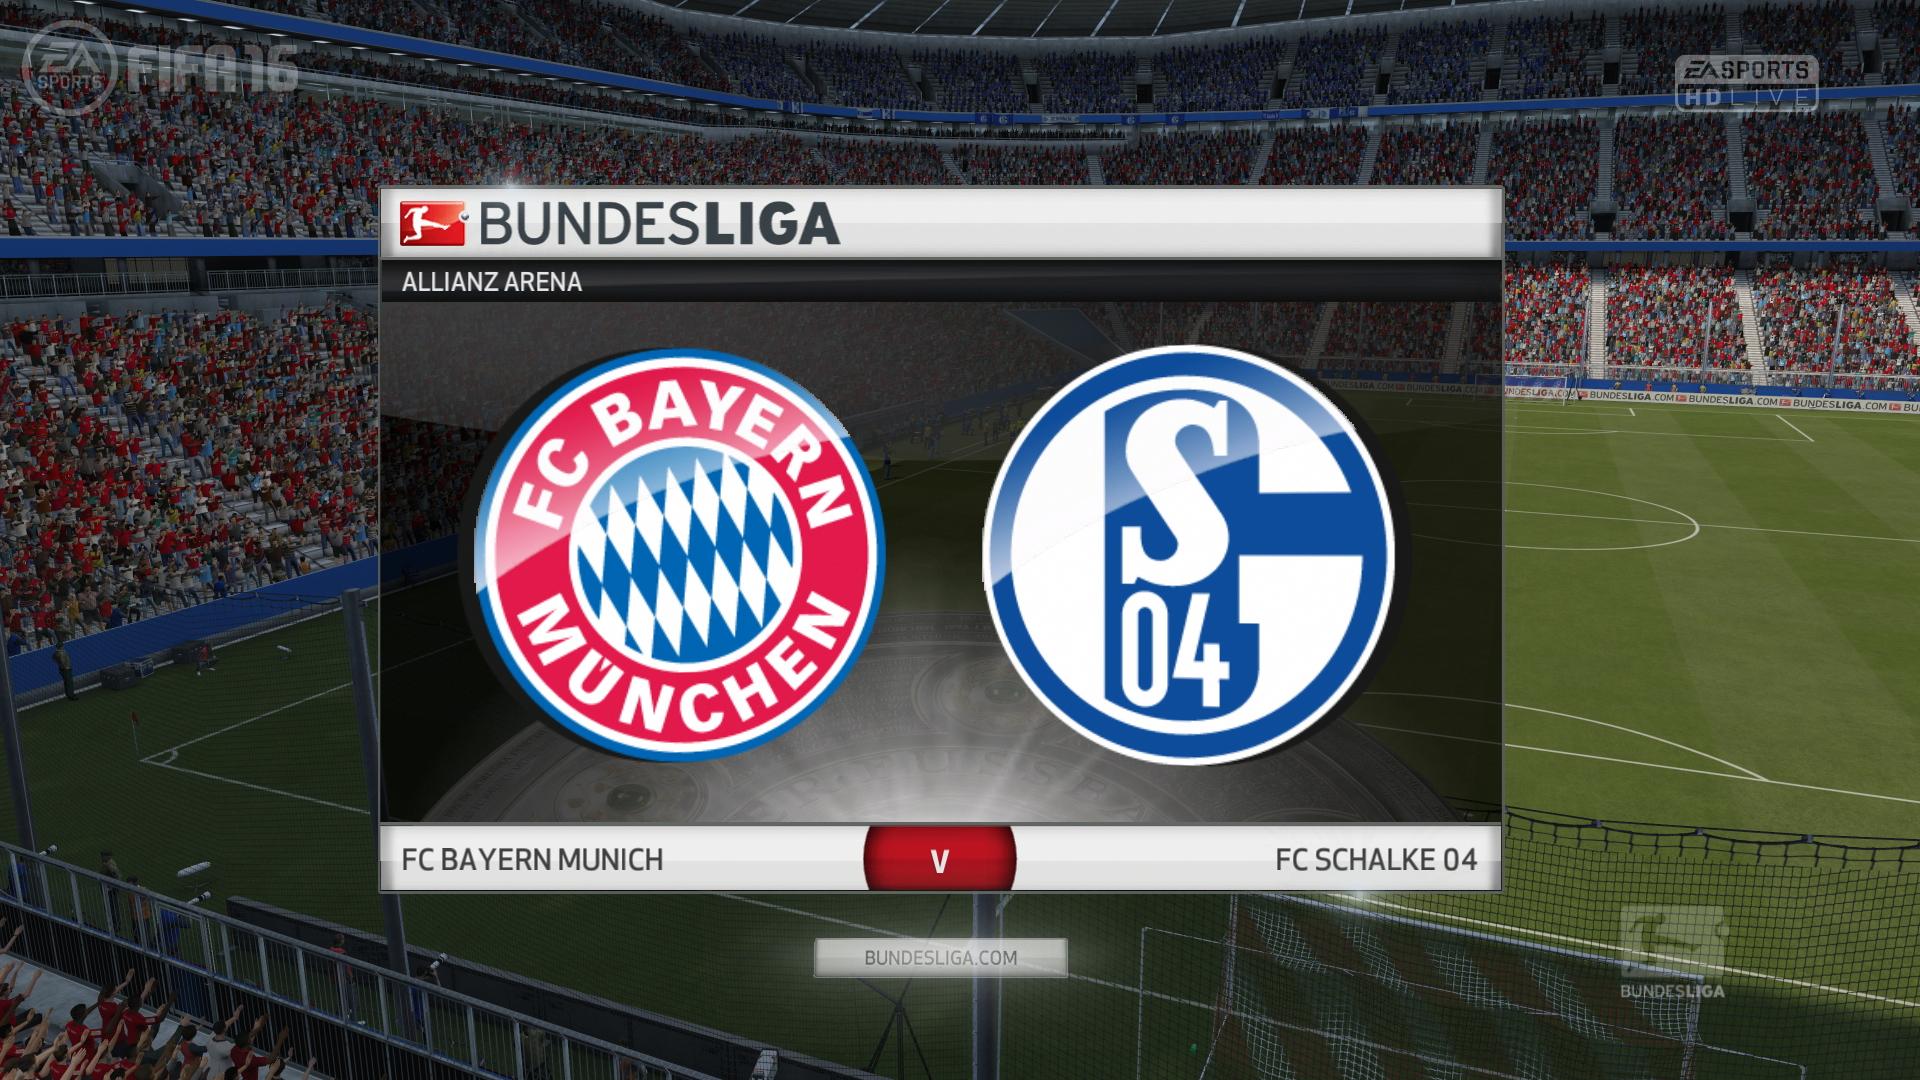 FIFA16_XboxOne_PS4_Gamescom_BundesligaOverlay13_wWM